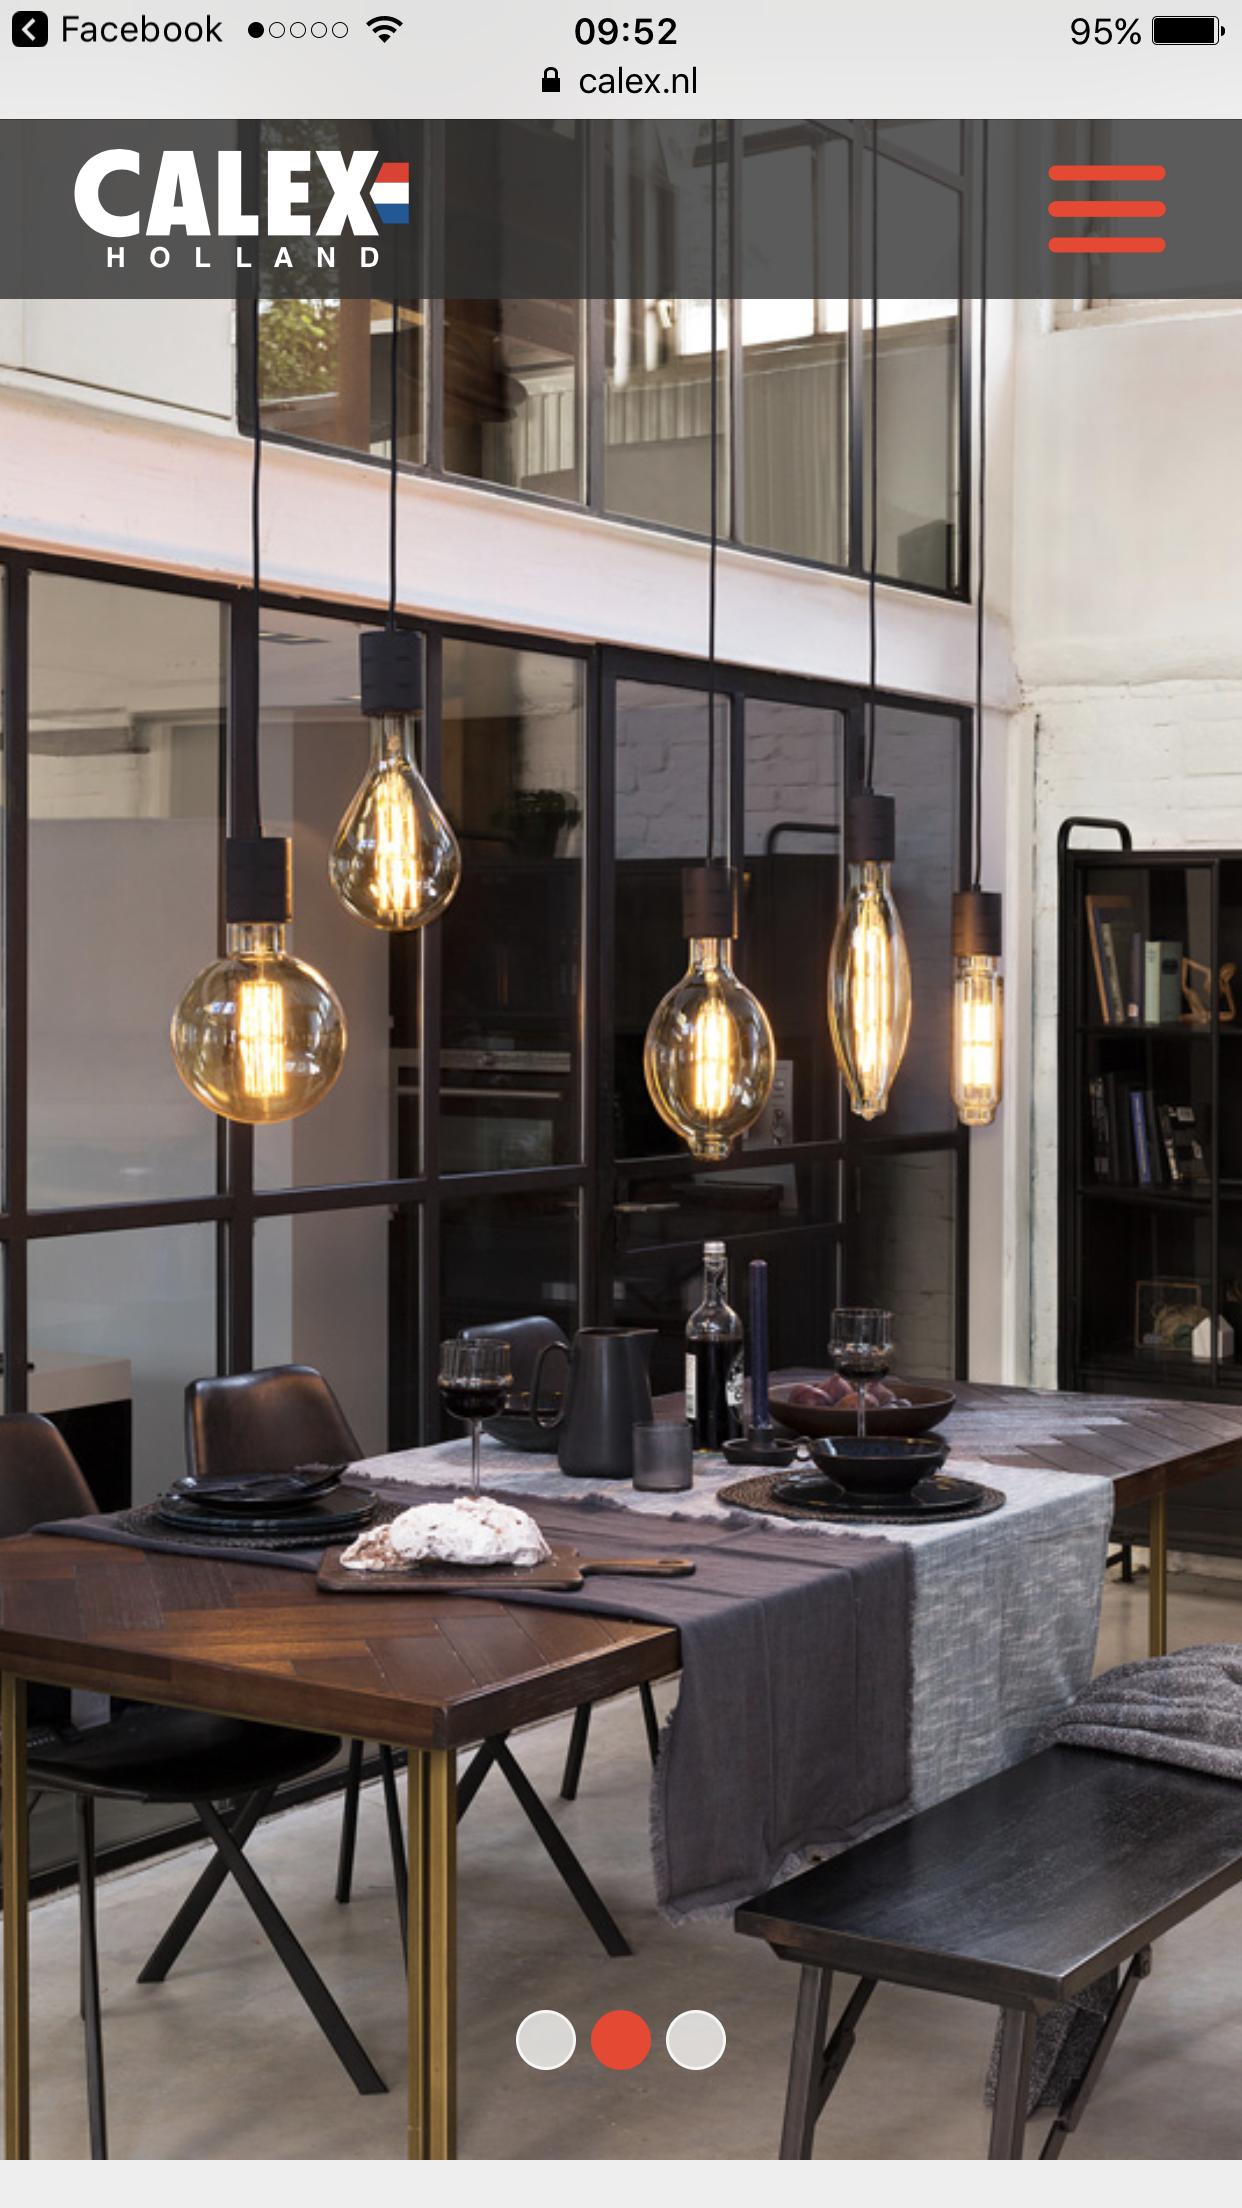 Calex giant xxl led filament lampen met e40 lampvoet en stoere calex giant led lamps parisarafo Gallery